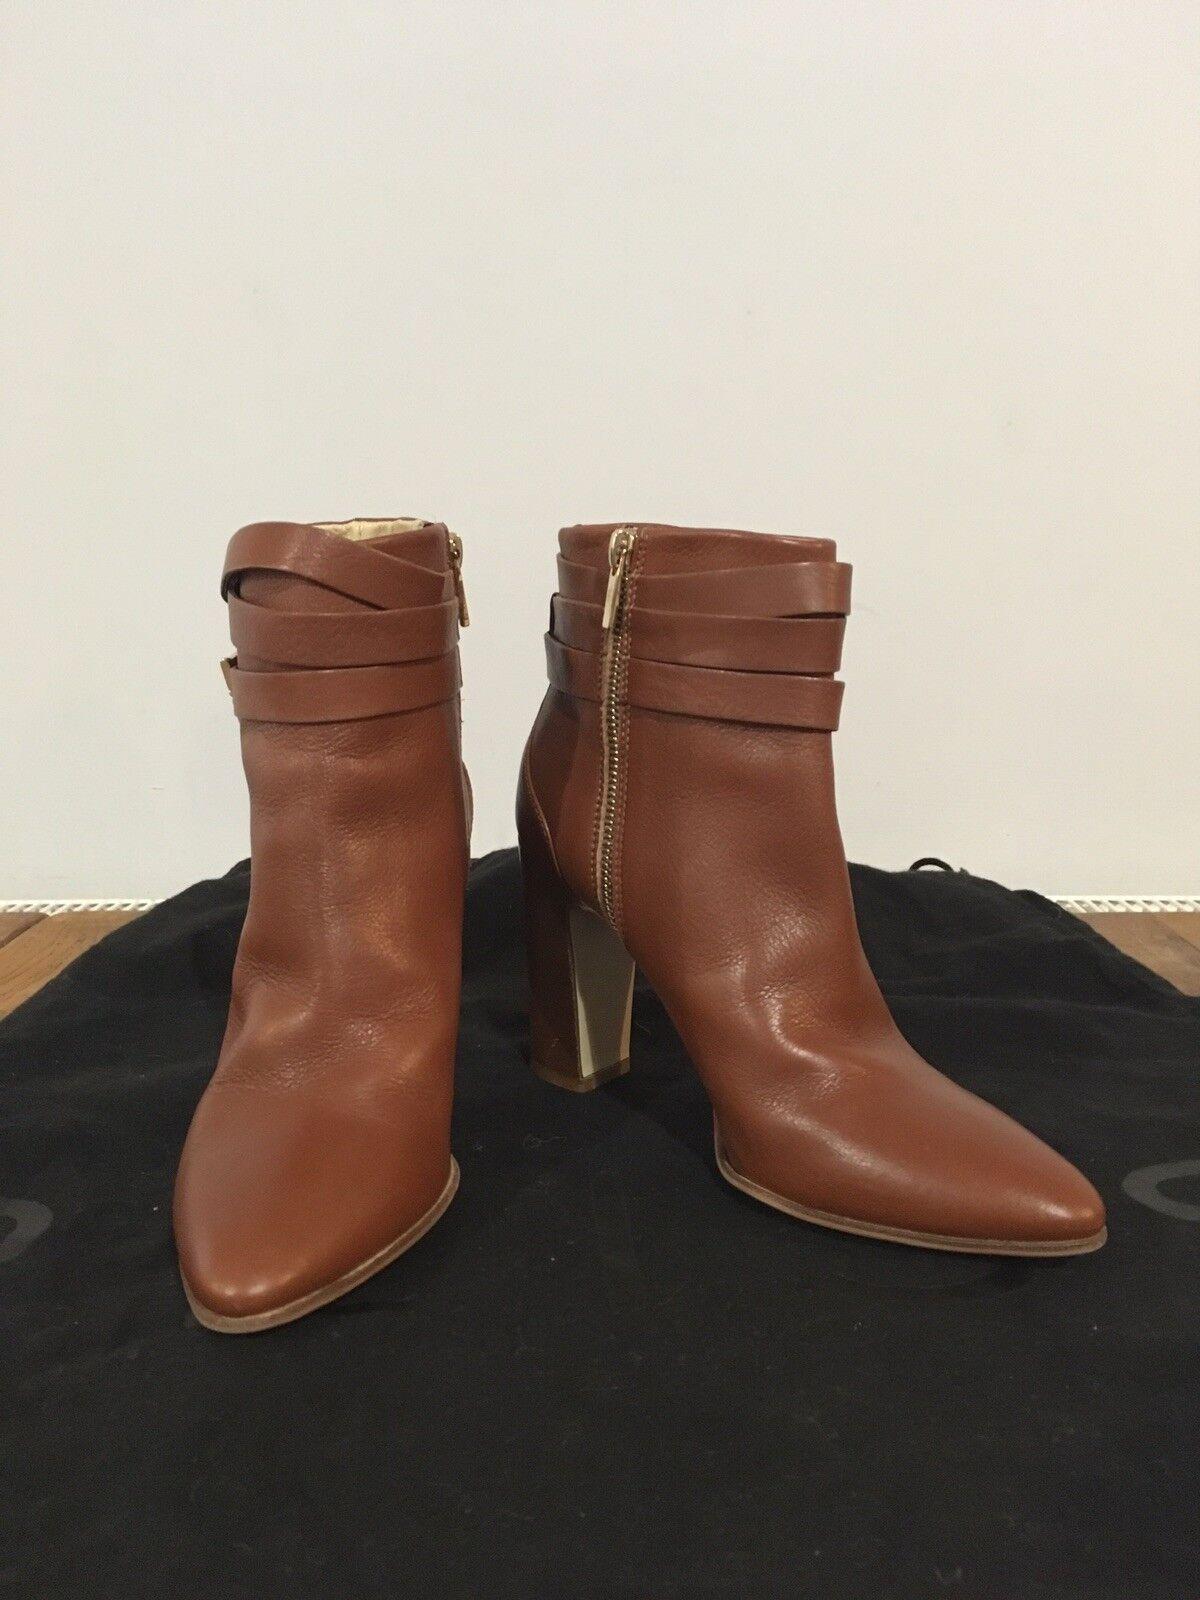 Hobbs London Tan Leather Ankle Stiefel Stiefel Stiefel Größe 37 (4) f2def8